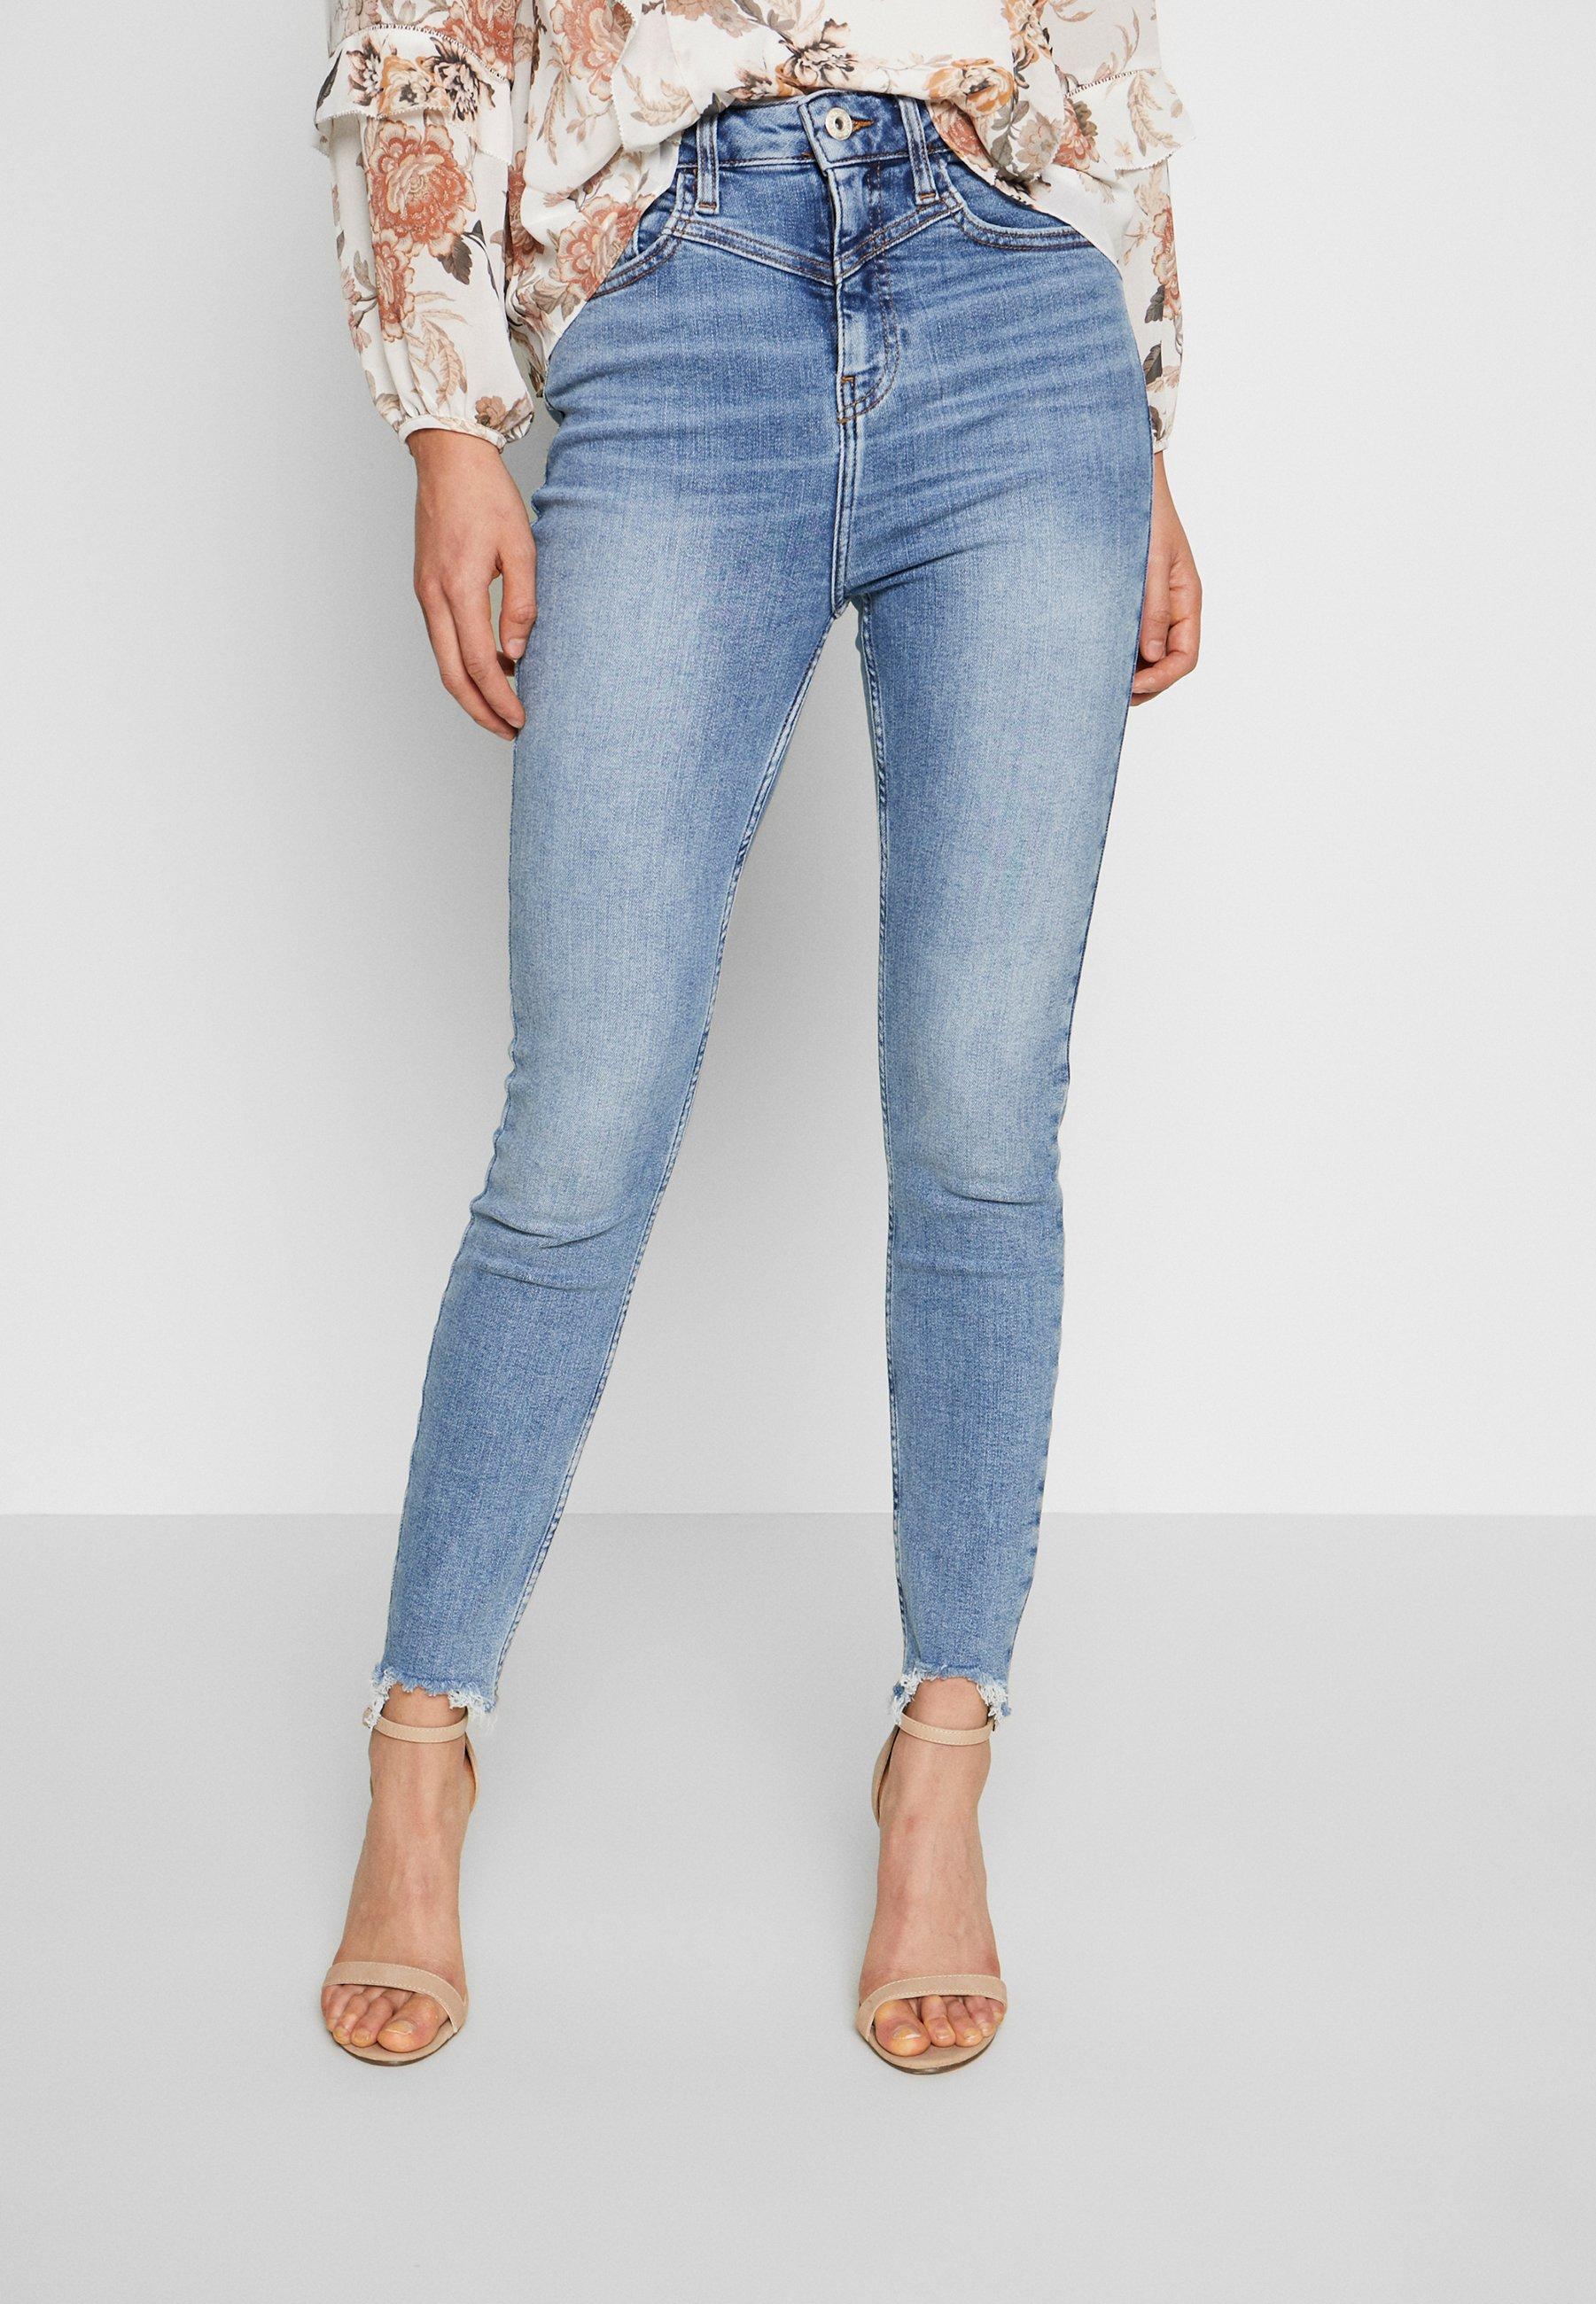 River Island HAILEY  - Jeans Skinny - mid wash - Jeans Femme Wkk2V